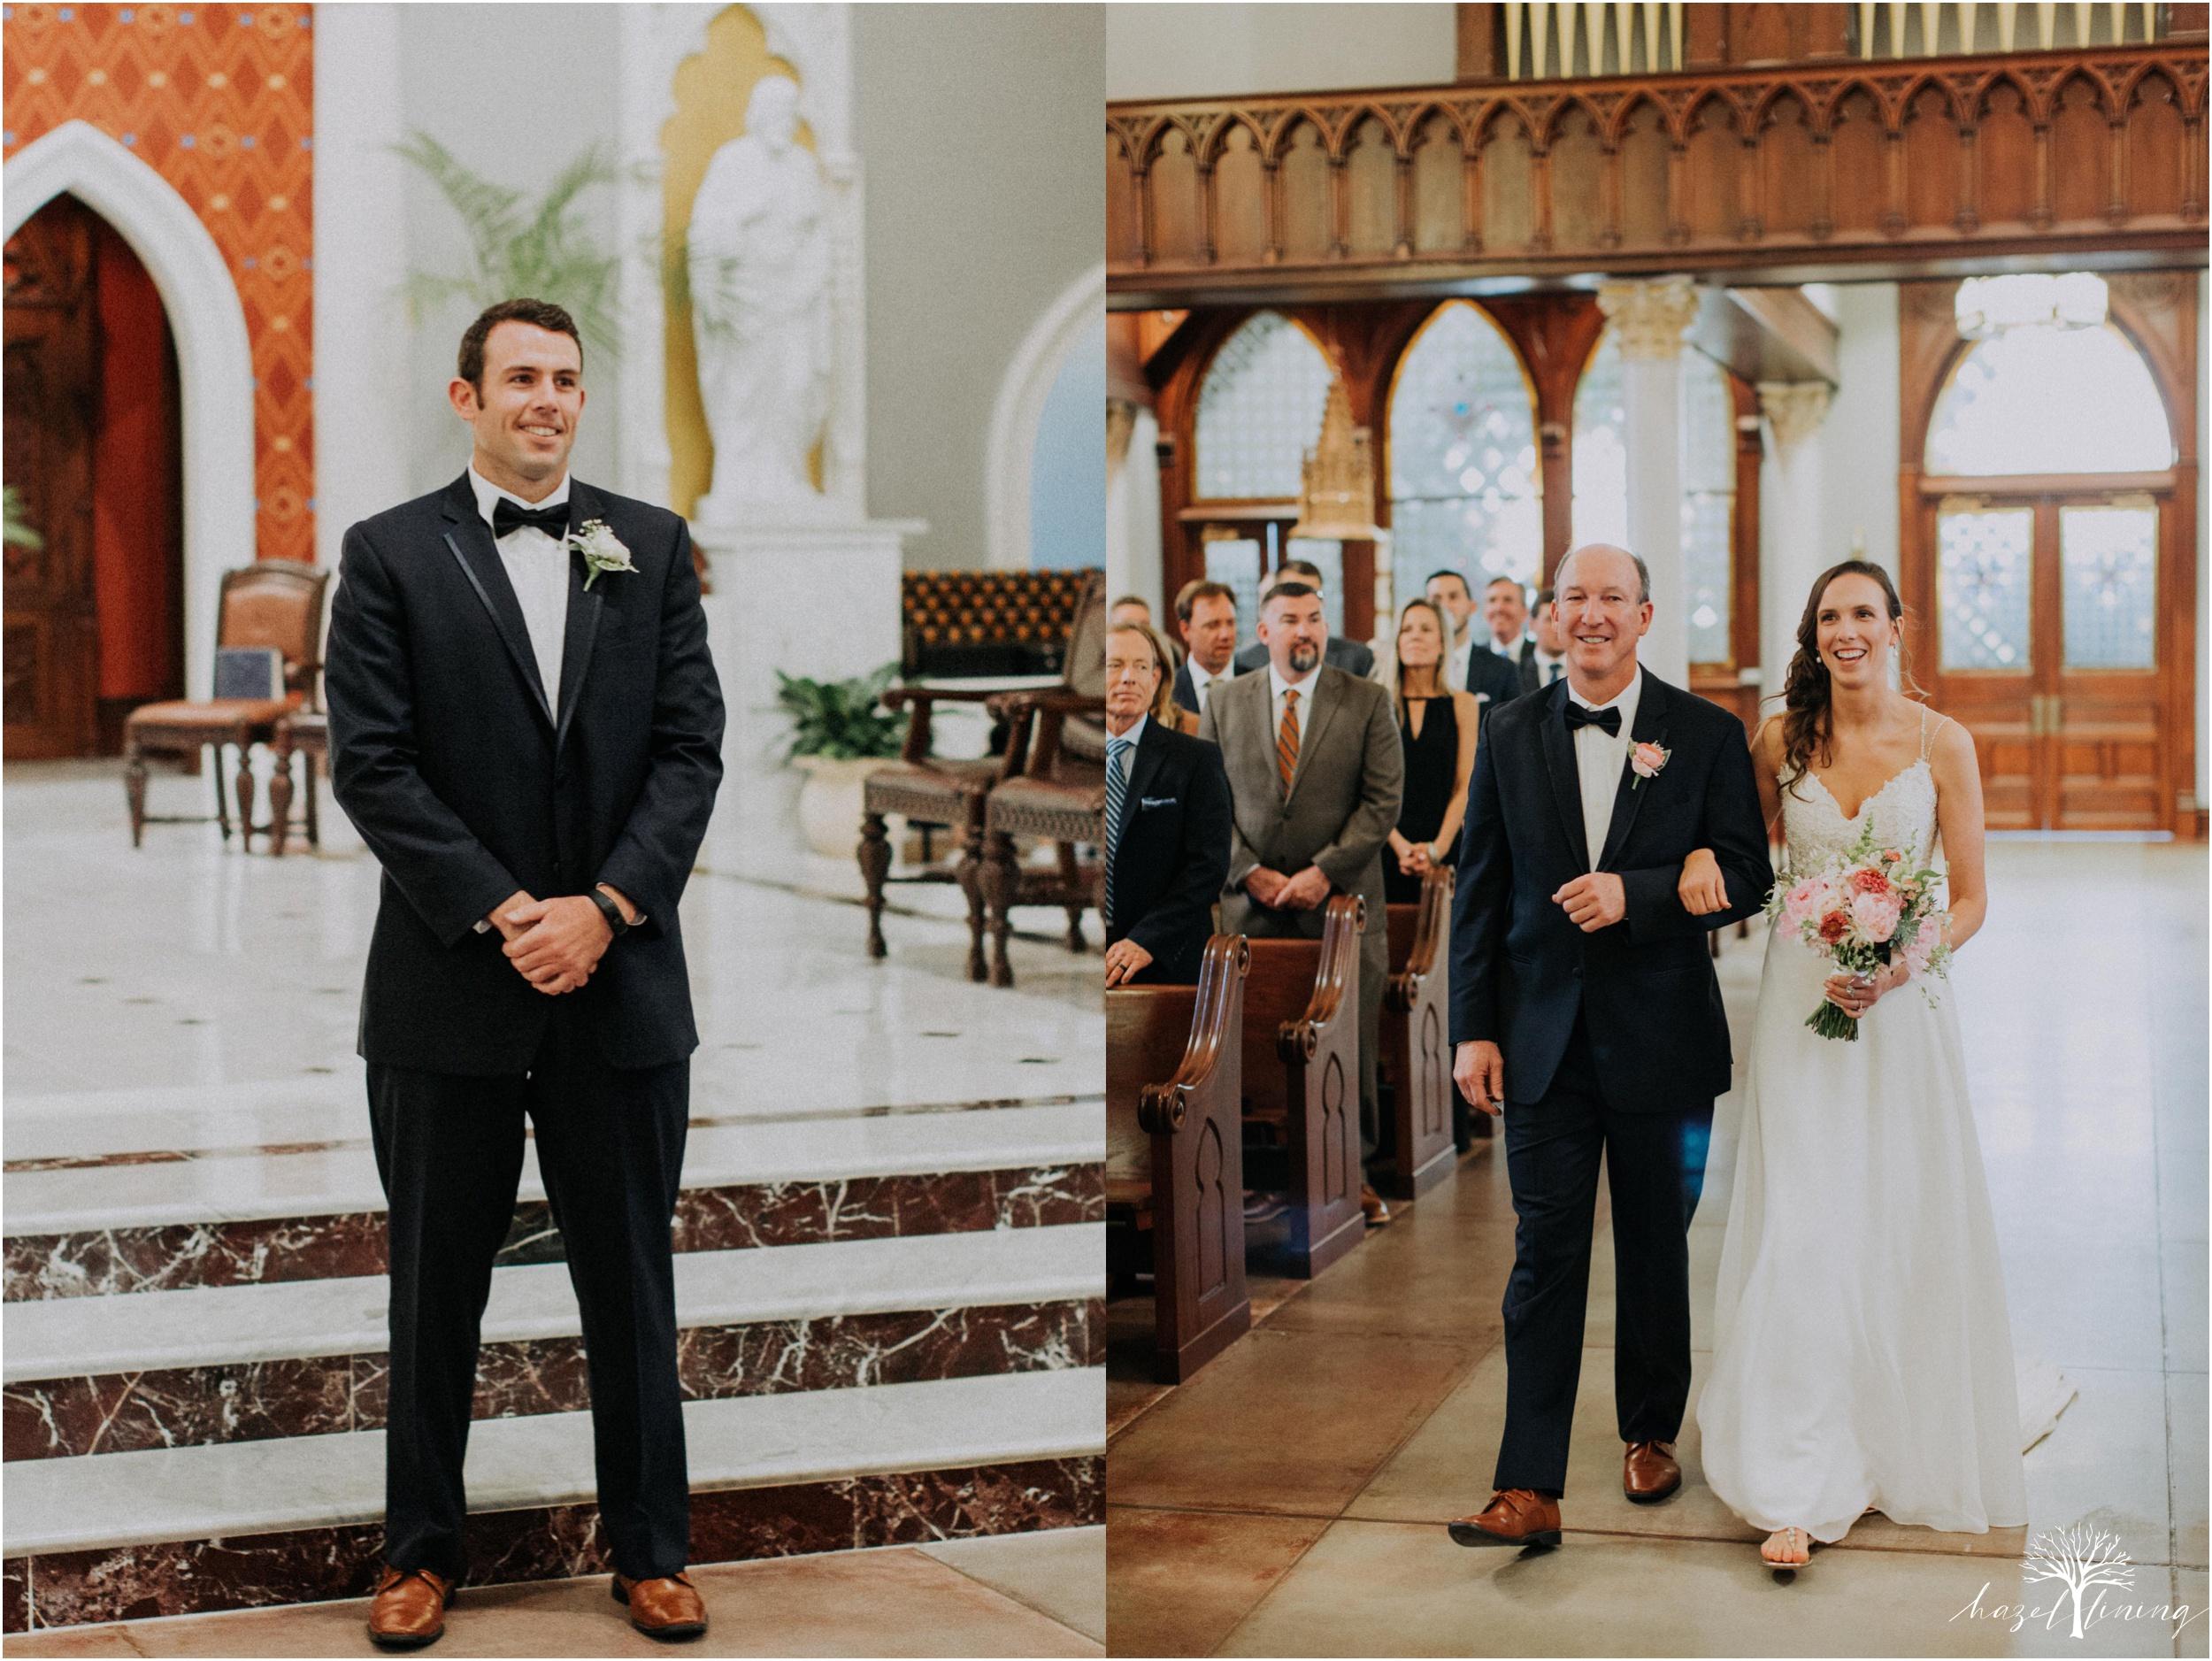 hazel-lining-travel-wedding-elopement-photography_0051.jpg